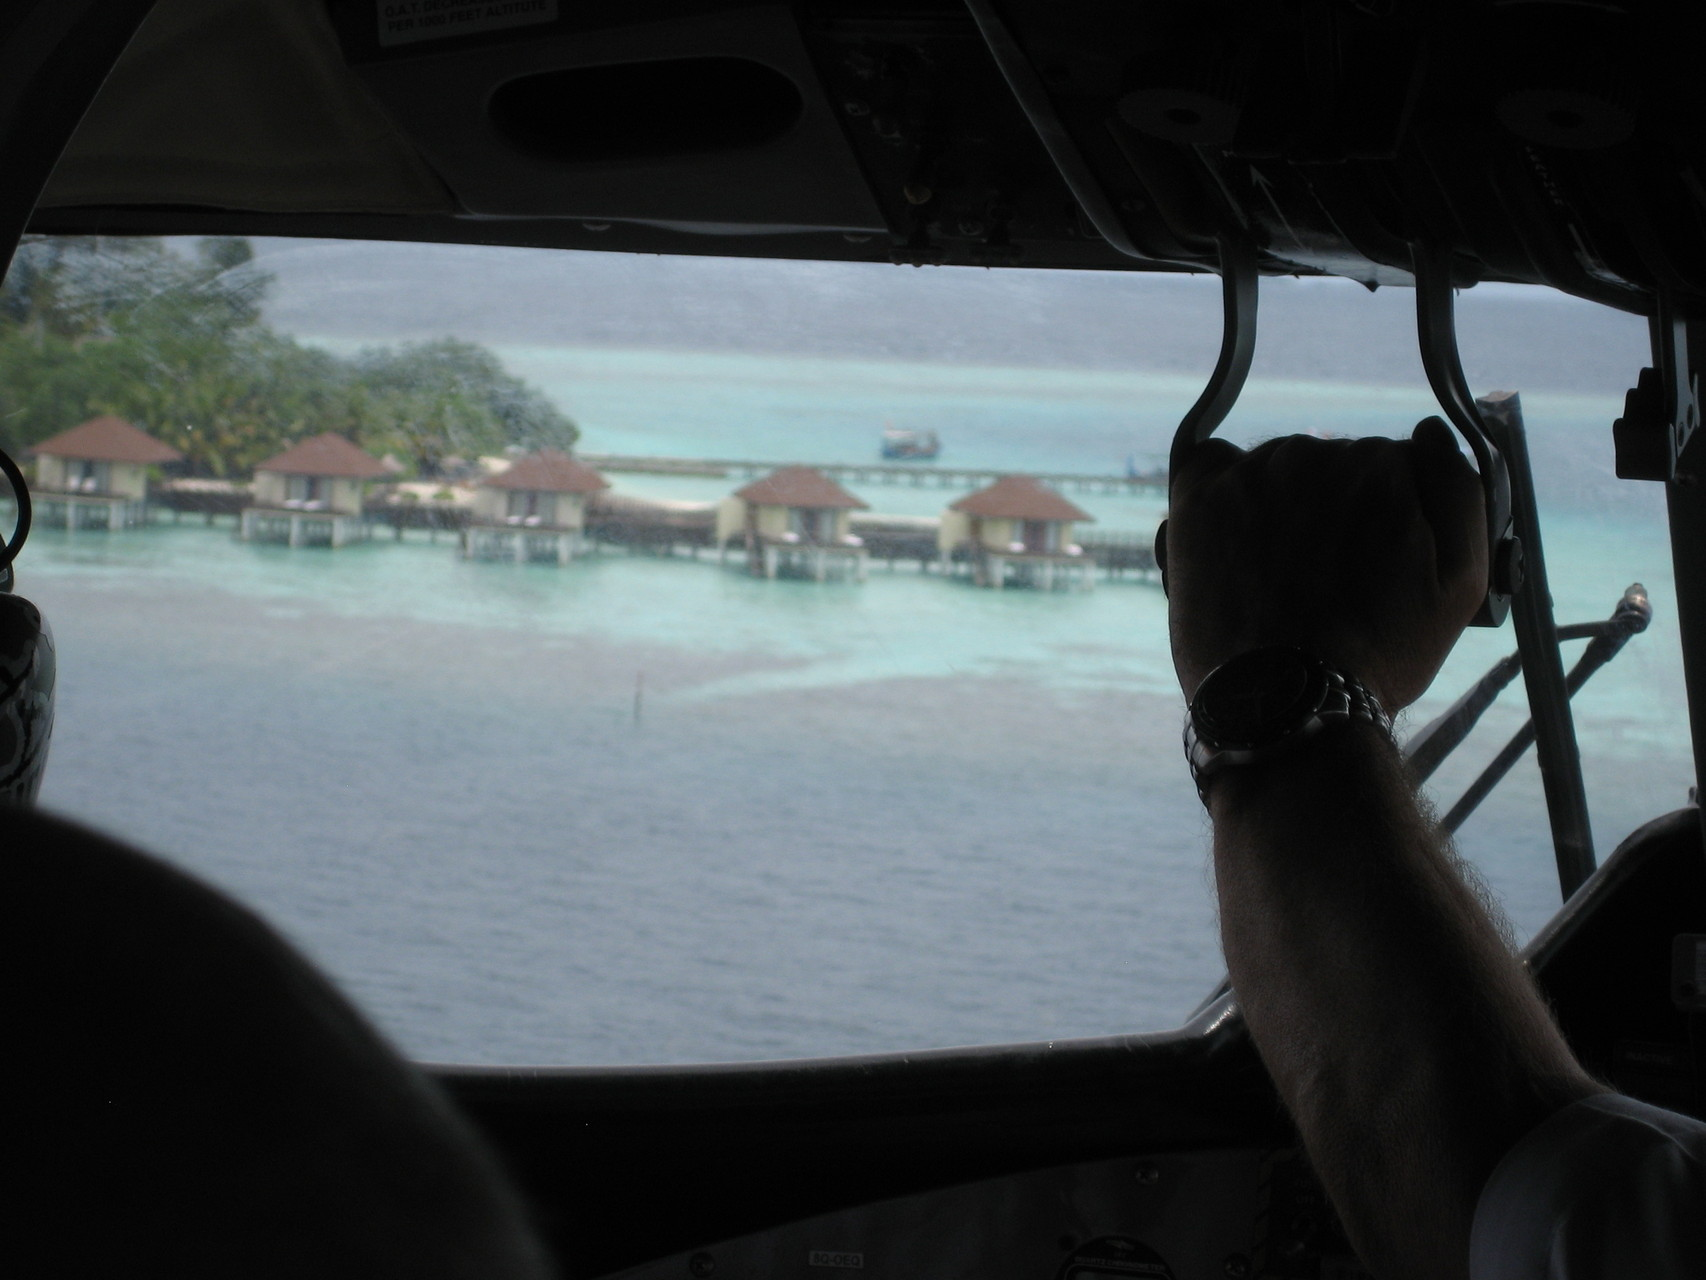 Landeanflug im Wasserflugzeug